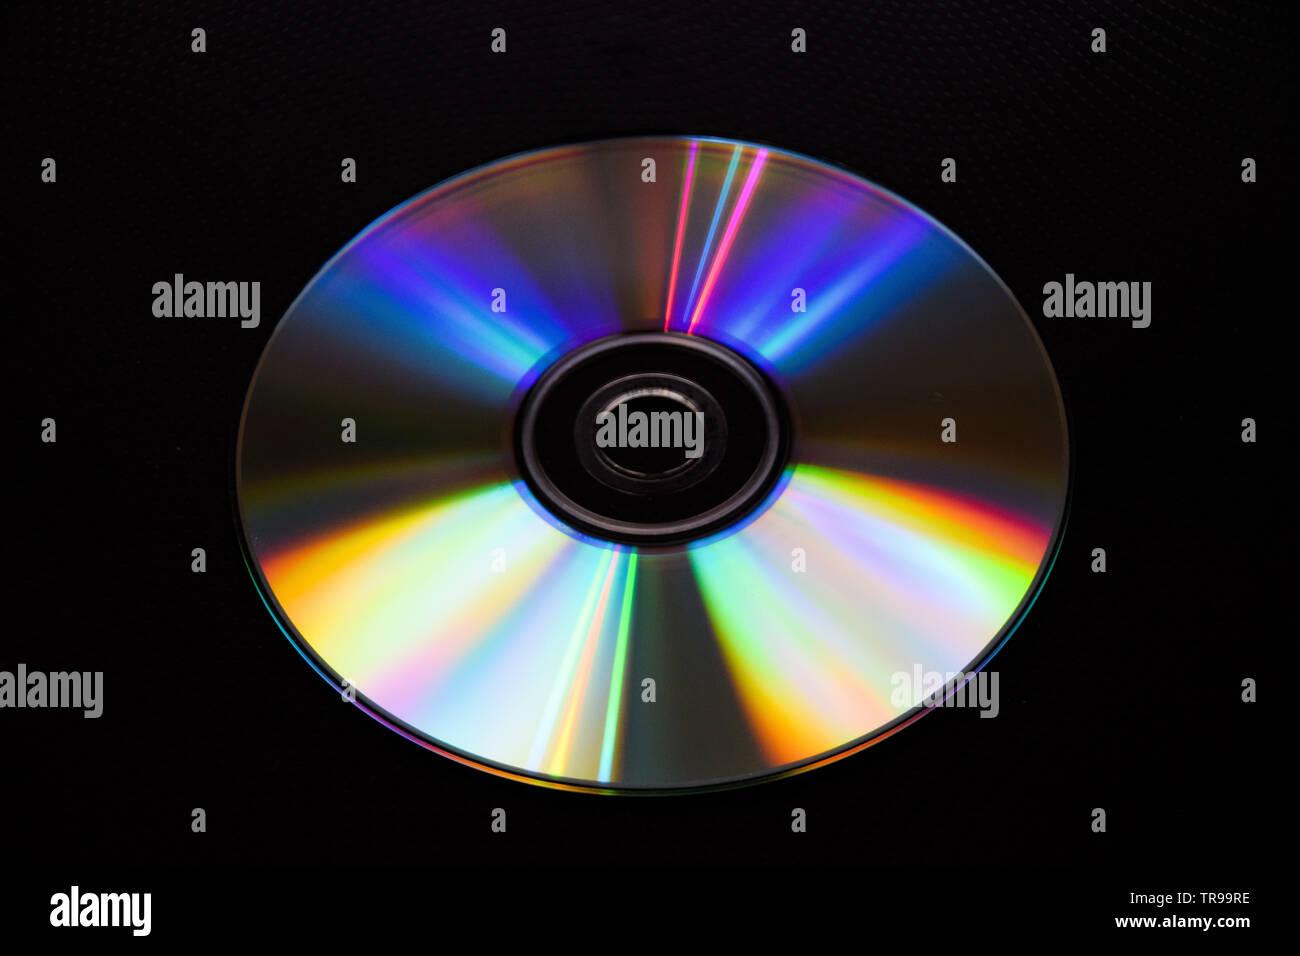 CD DVD CD-ROM Blu-ray disc computer storage data media music film games security plastic - Stock Image